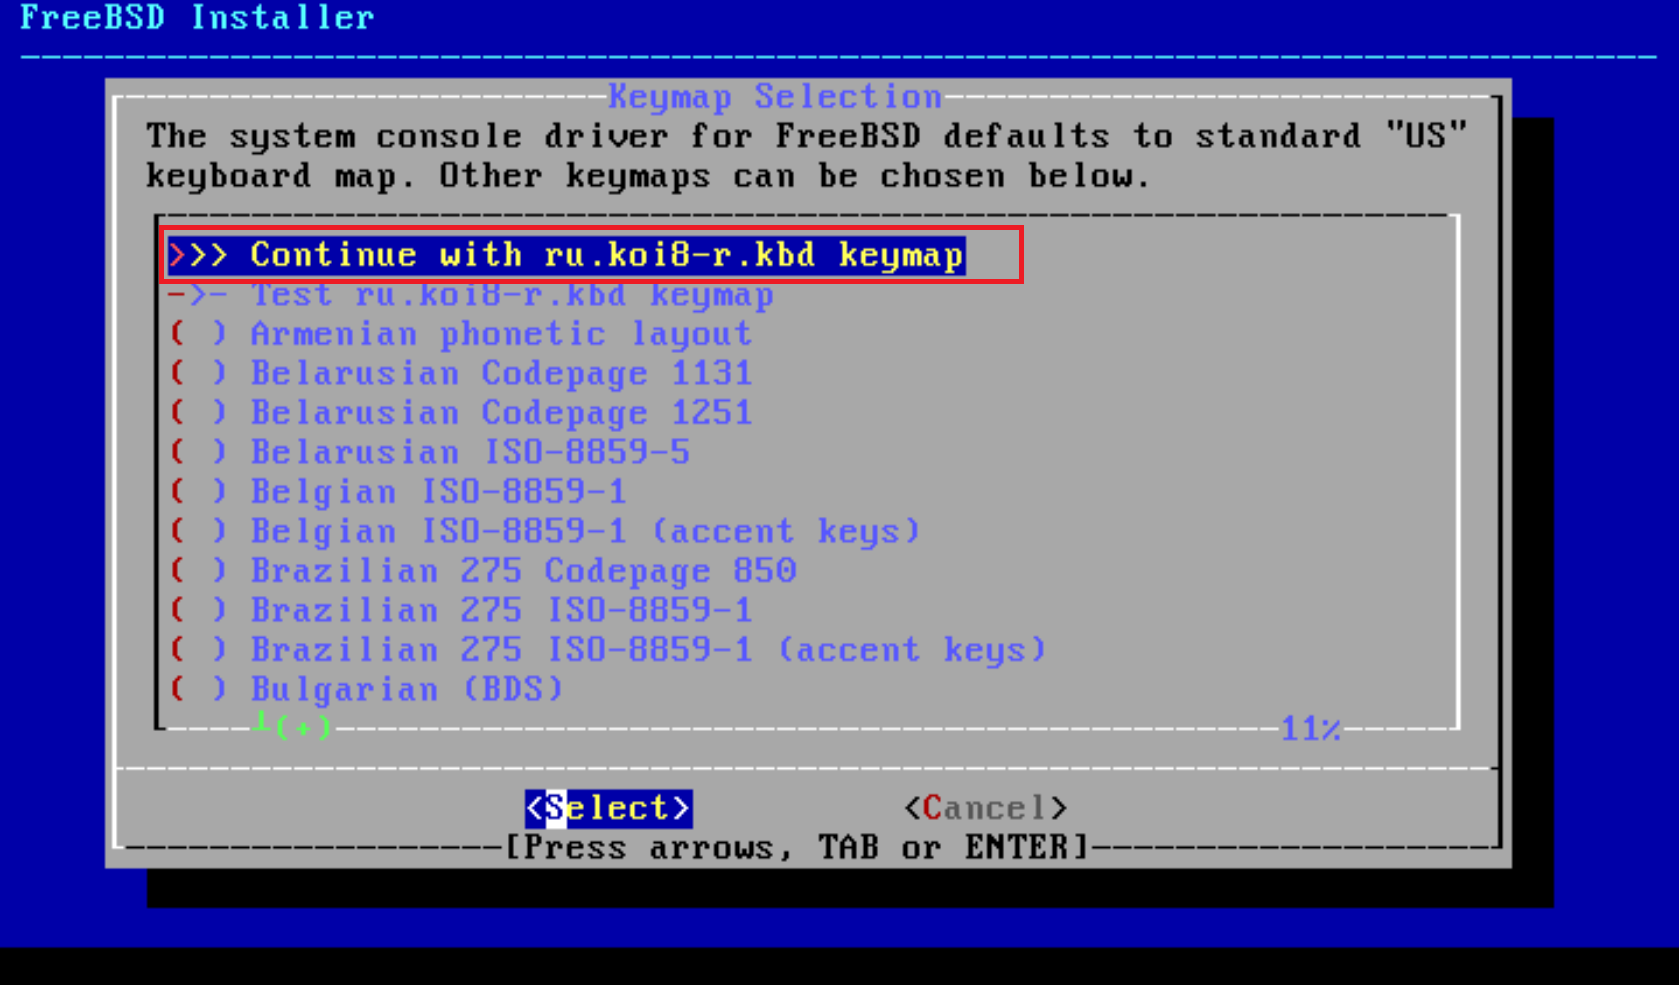 Установка FreeBSD и графической оболочки с USB флешки | Lyapidov